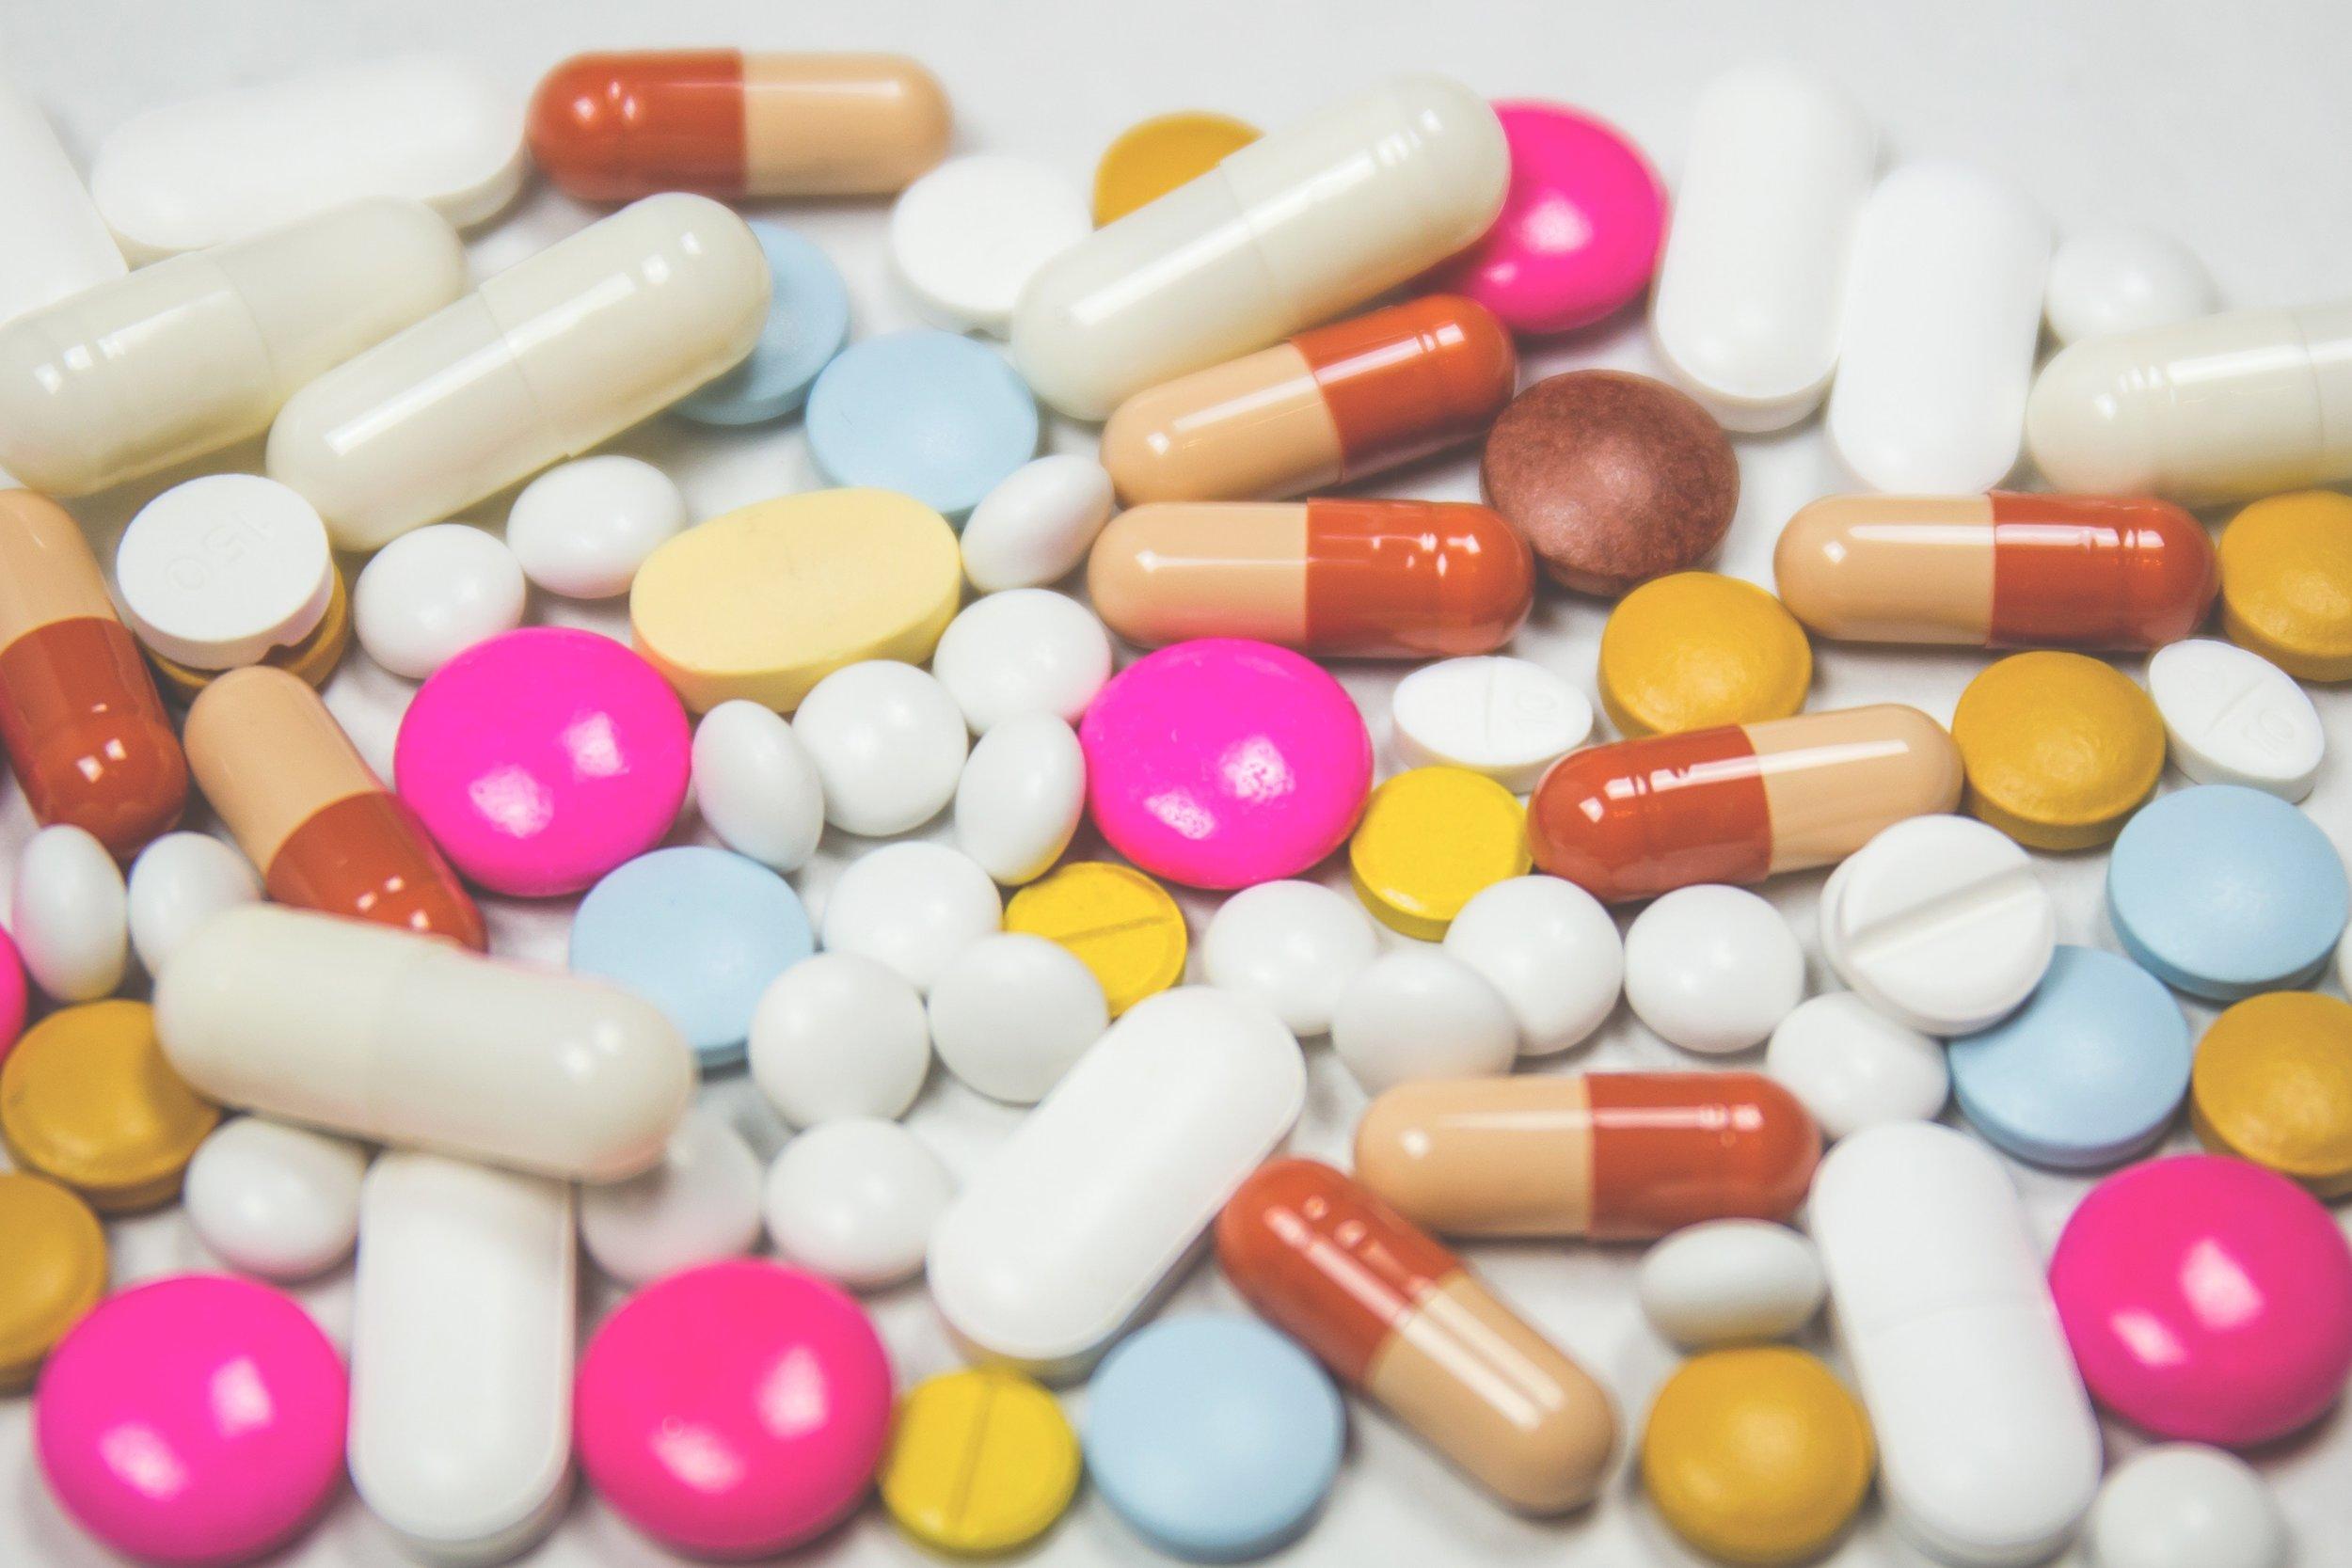 pills, pills, pills, pills, pills